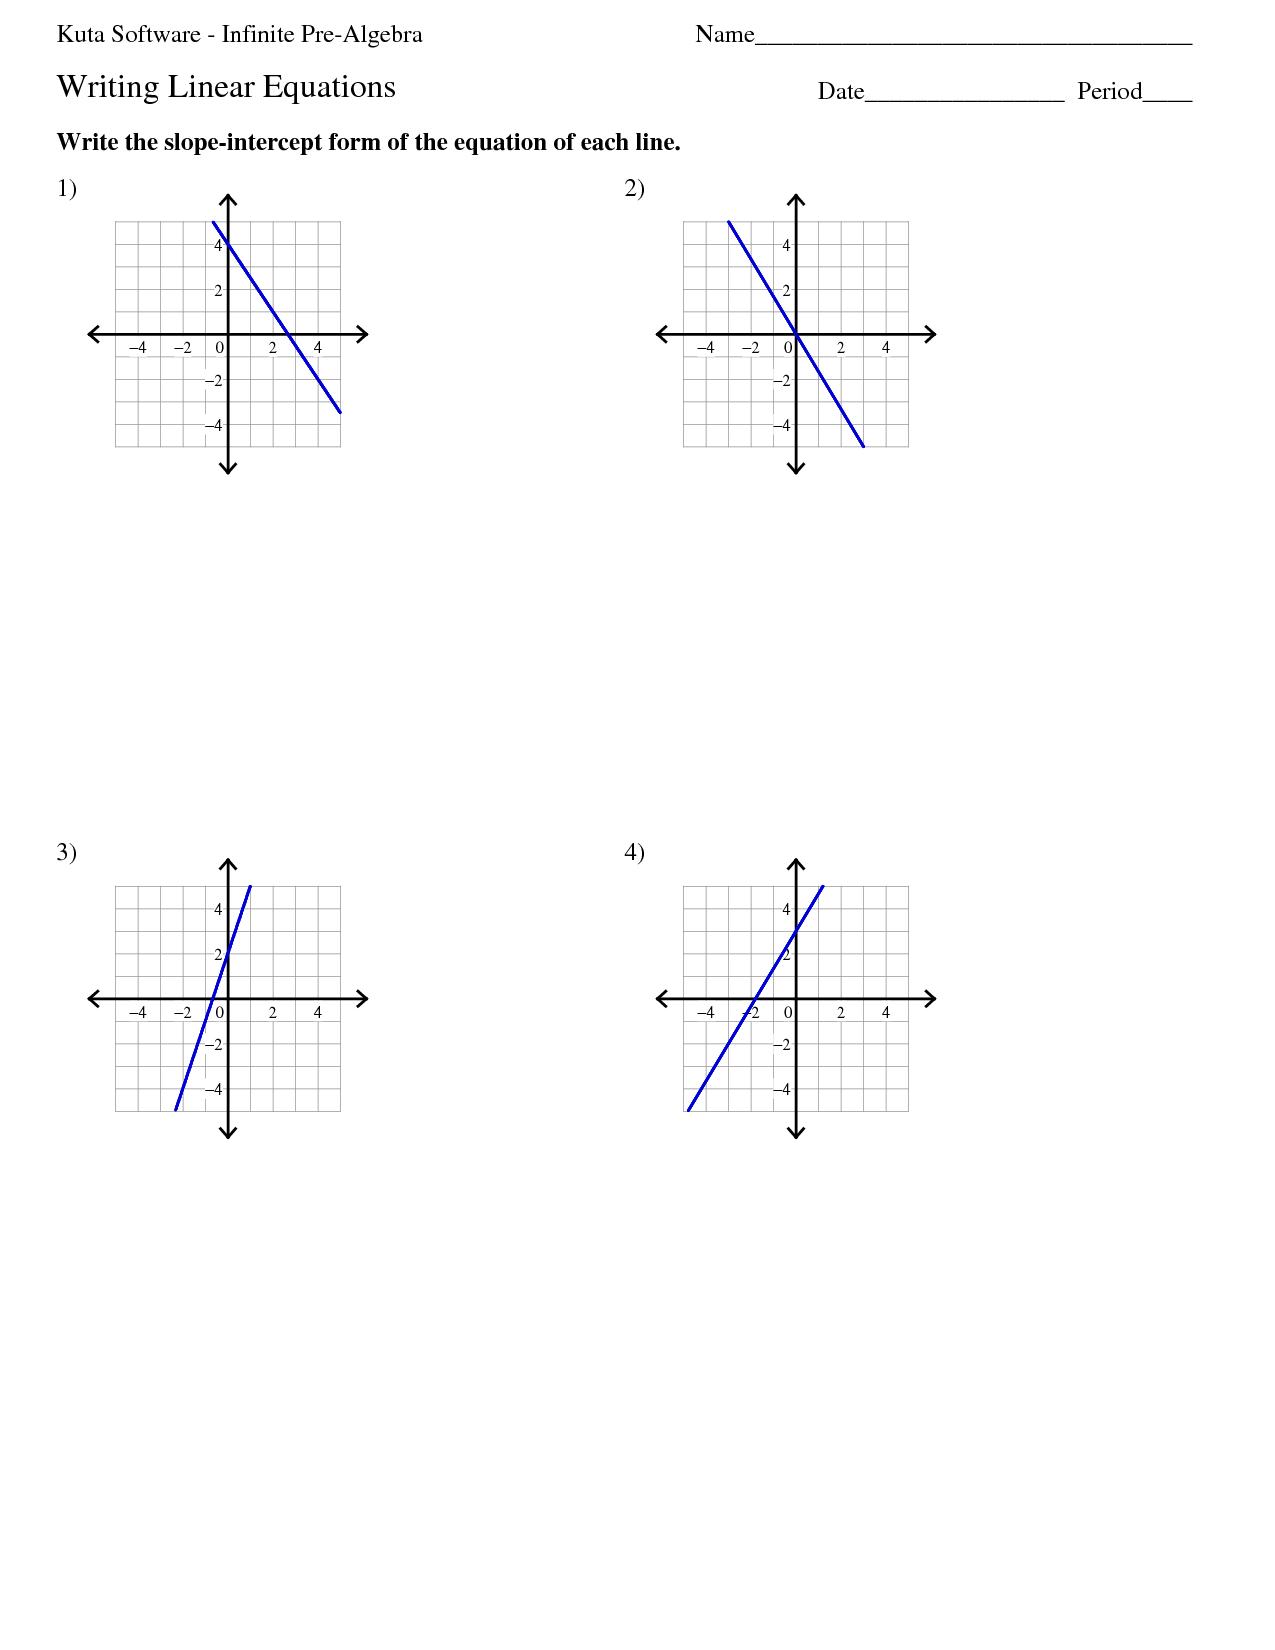 Algebra 1 Point Slope Form Worksheet Key